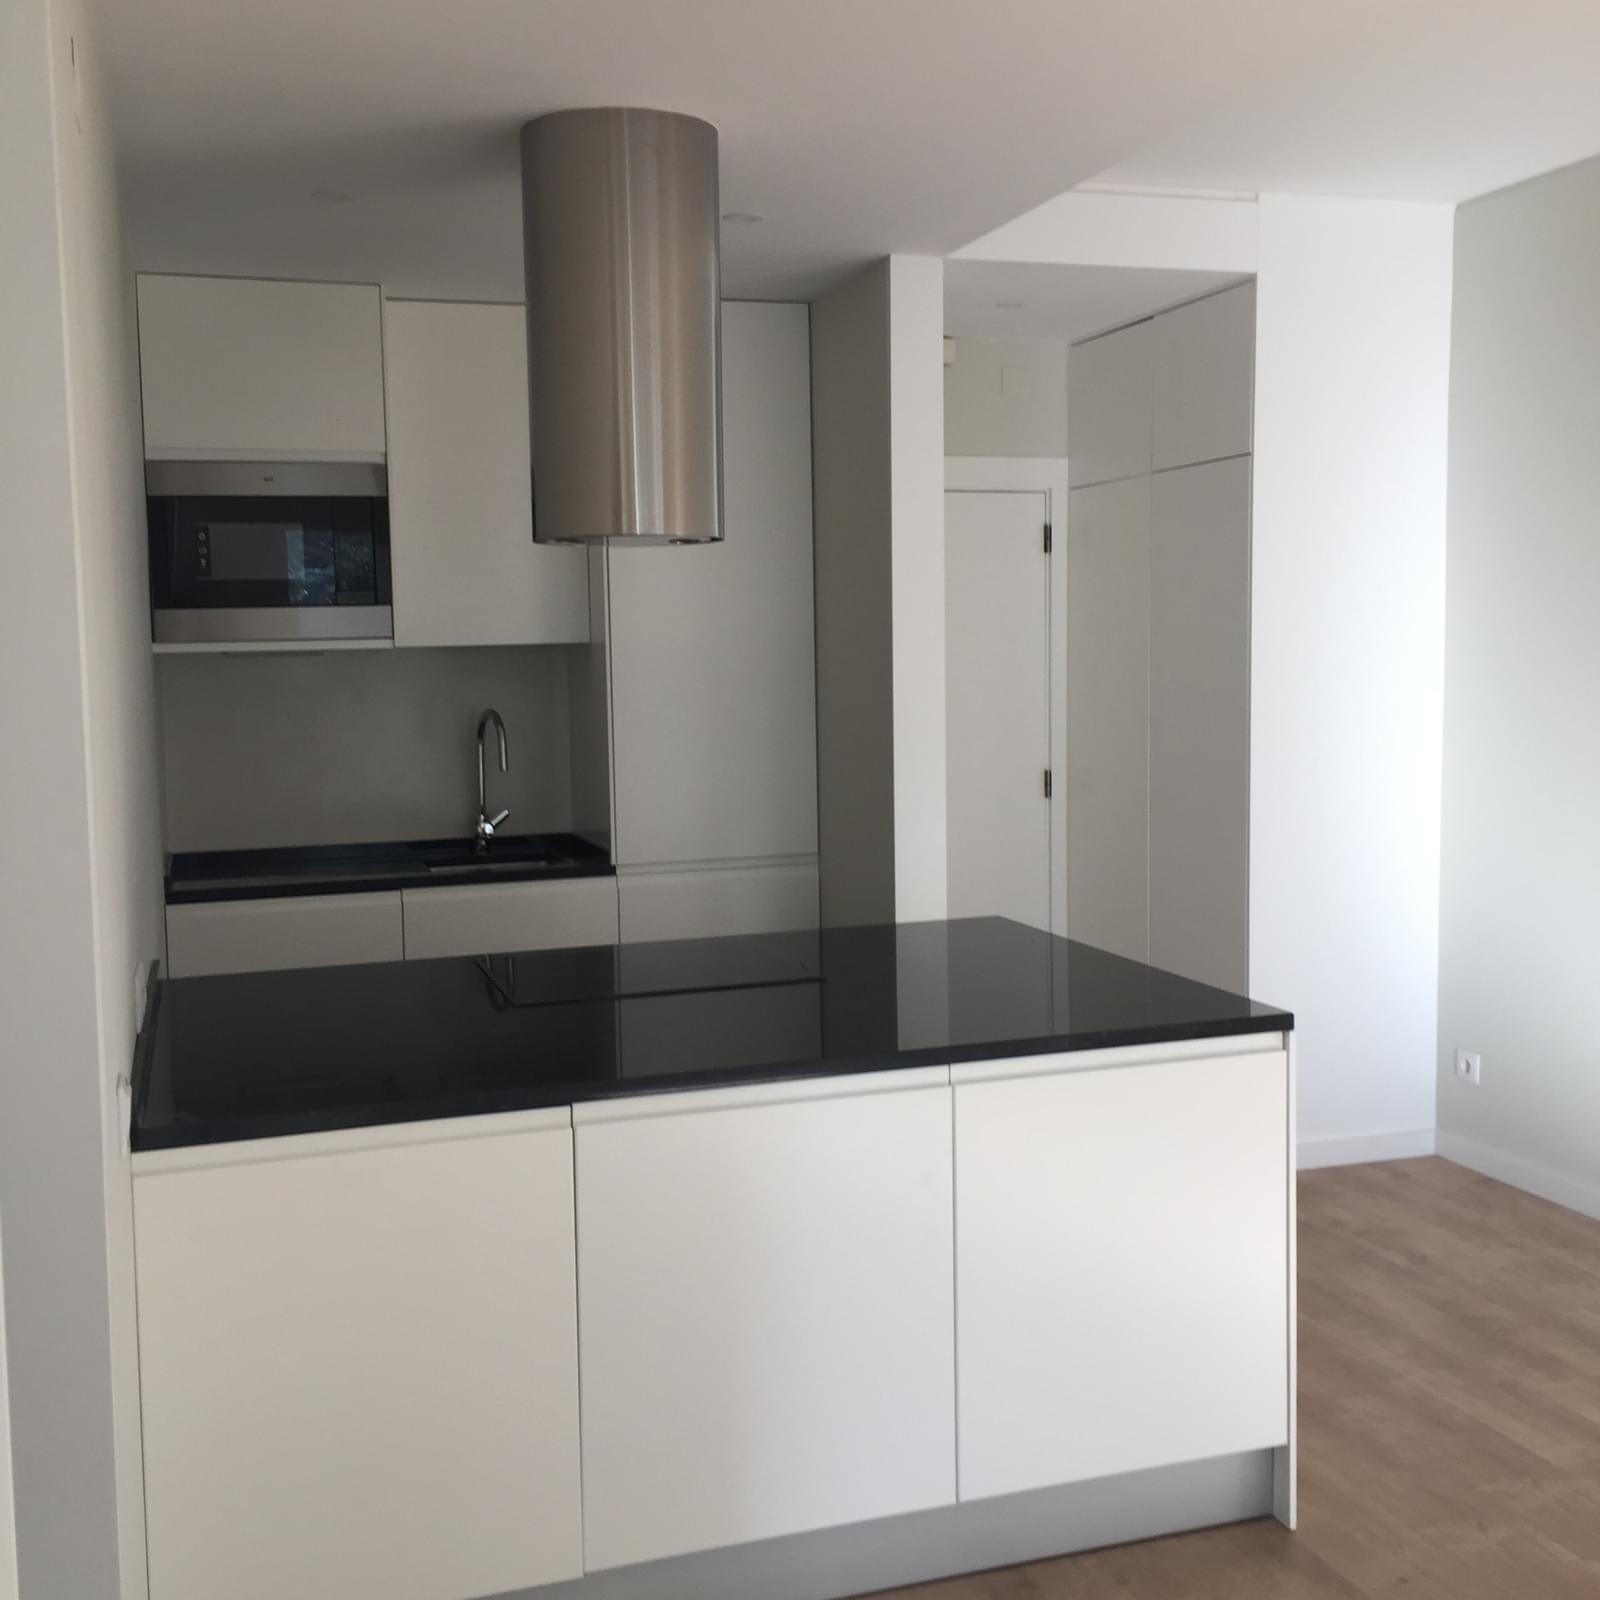 pf18756-apartamento-t2-cascais-1b3ac7ee-a01e-45c5-a2e4-64d0a8c2a452